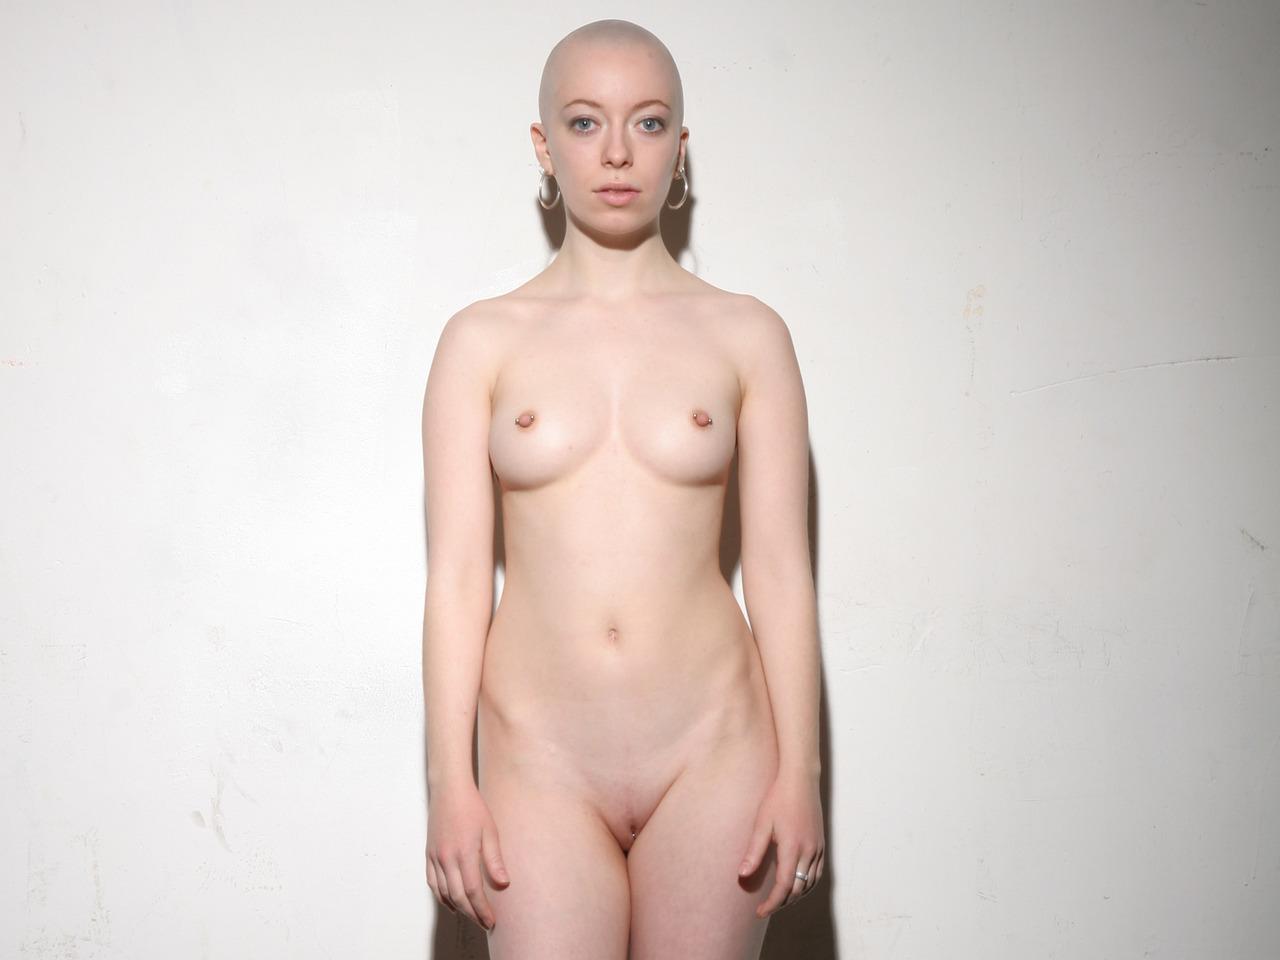 bald women naked pics